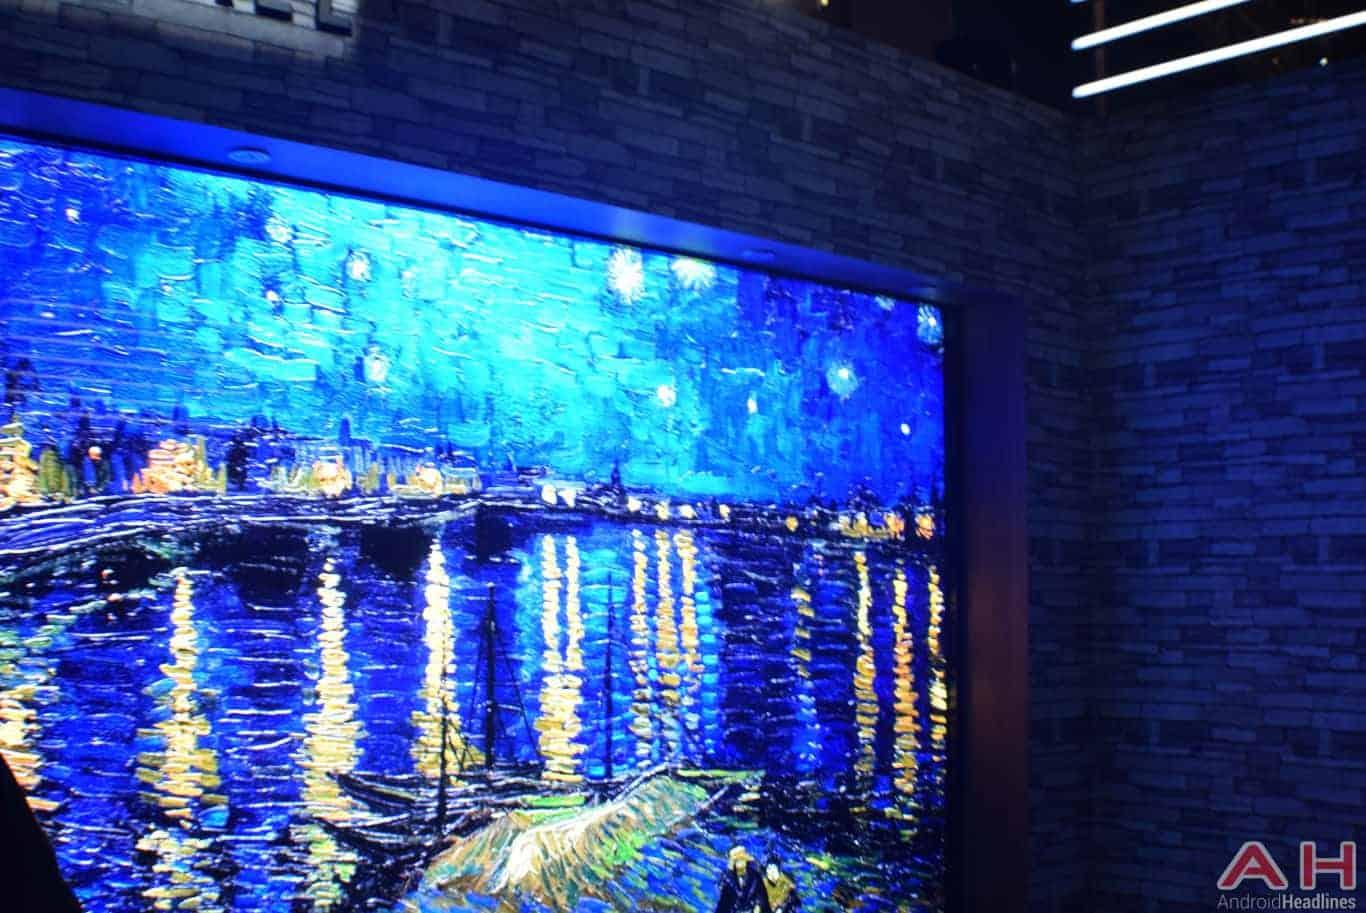 Samsung The Wall Modular MicroLED TV CES 2018 AH 1